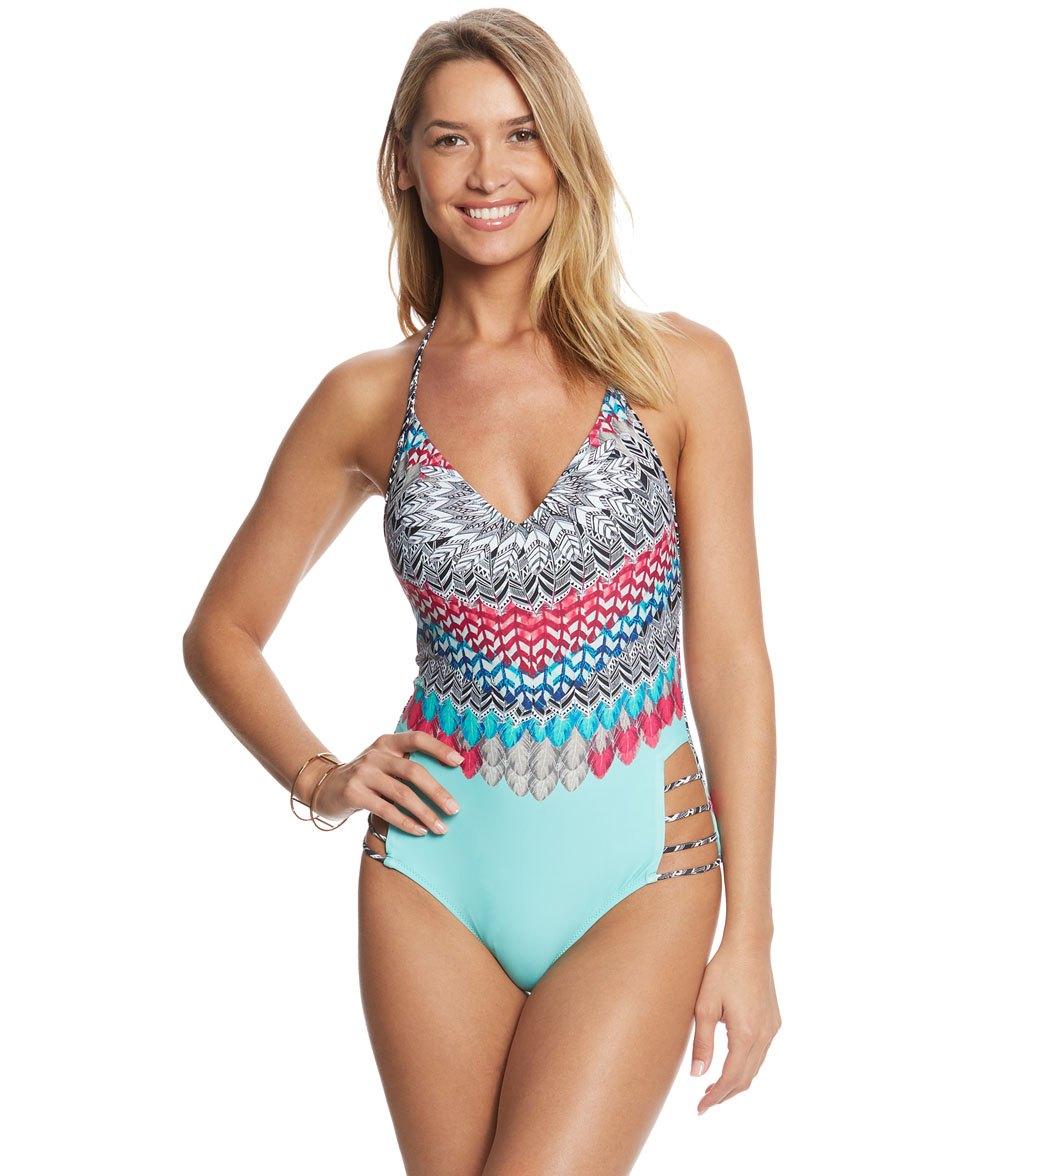 59a597aad971b ... Jessica Simpson Swimwear Dakota Placement Strap Back One Piece Swimsuit  Play Video. MODEL MEASUREMENTS